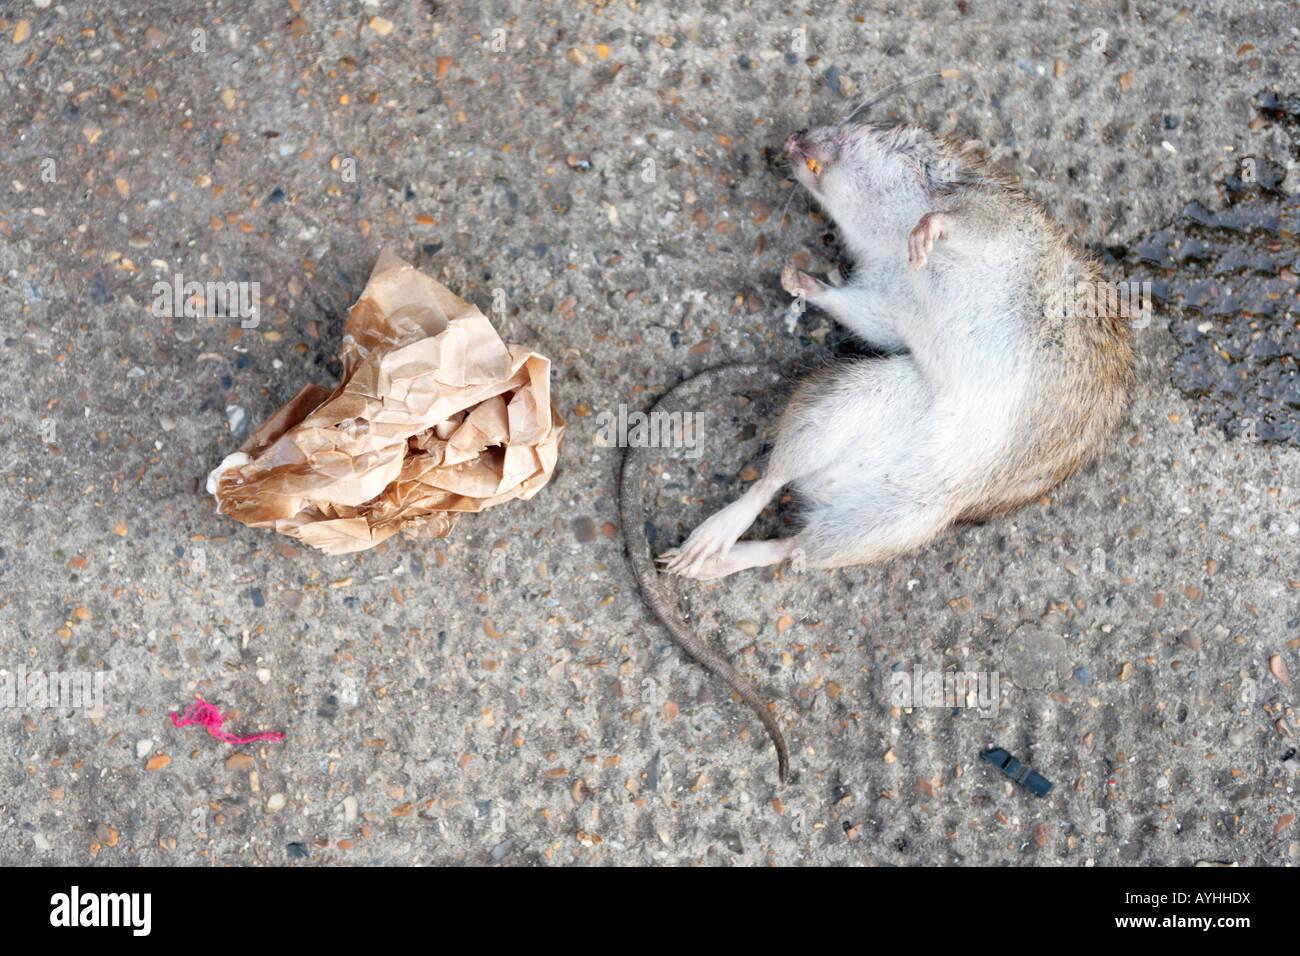 a dead rat in london - Stock Image